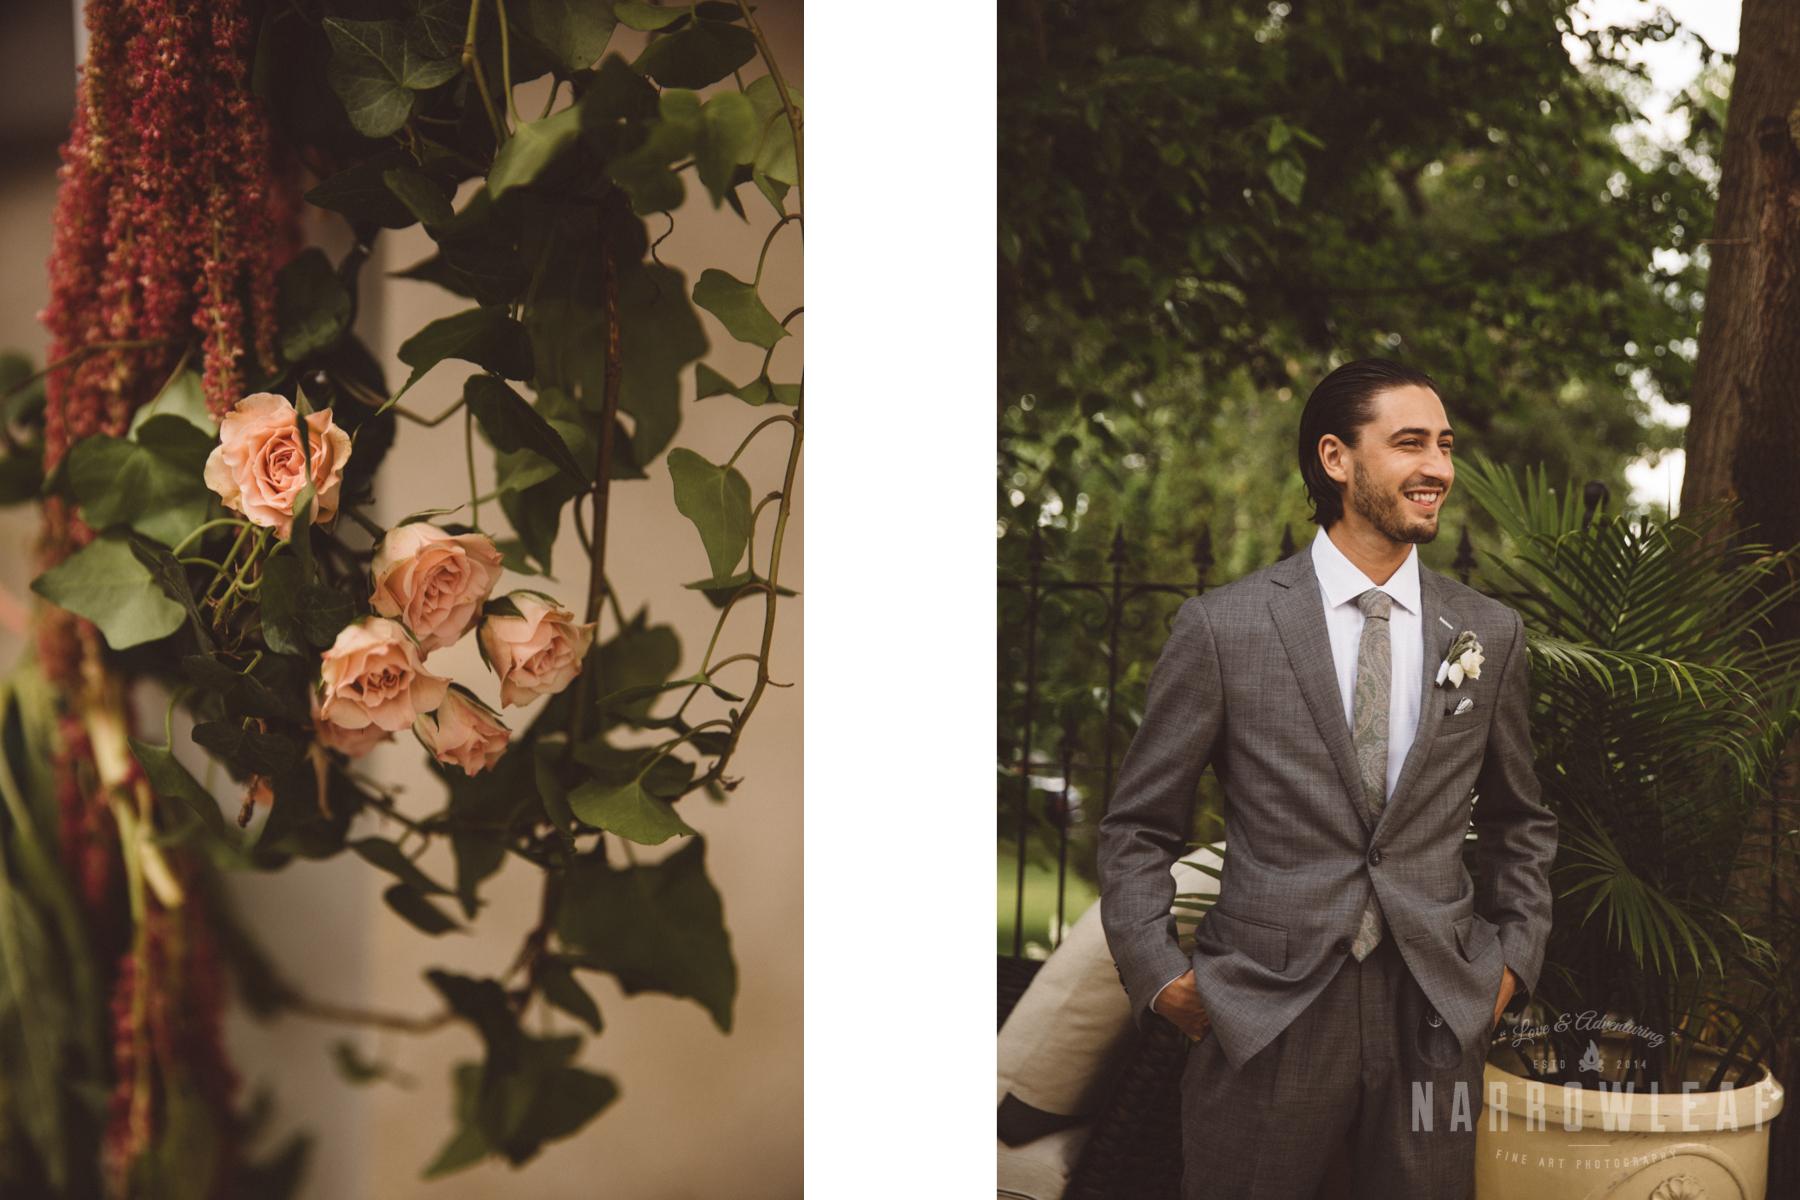 lake-geneva-wi-Wedding-ceremony-groom.jpg